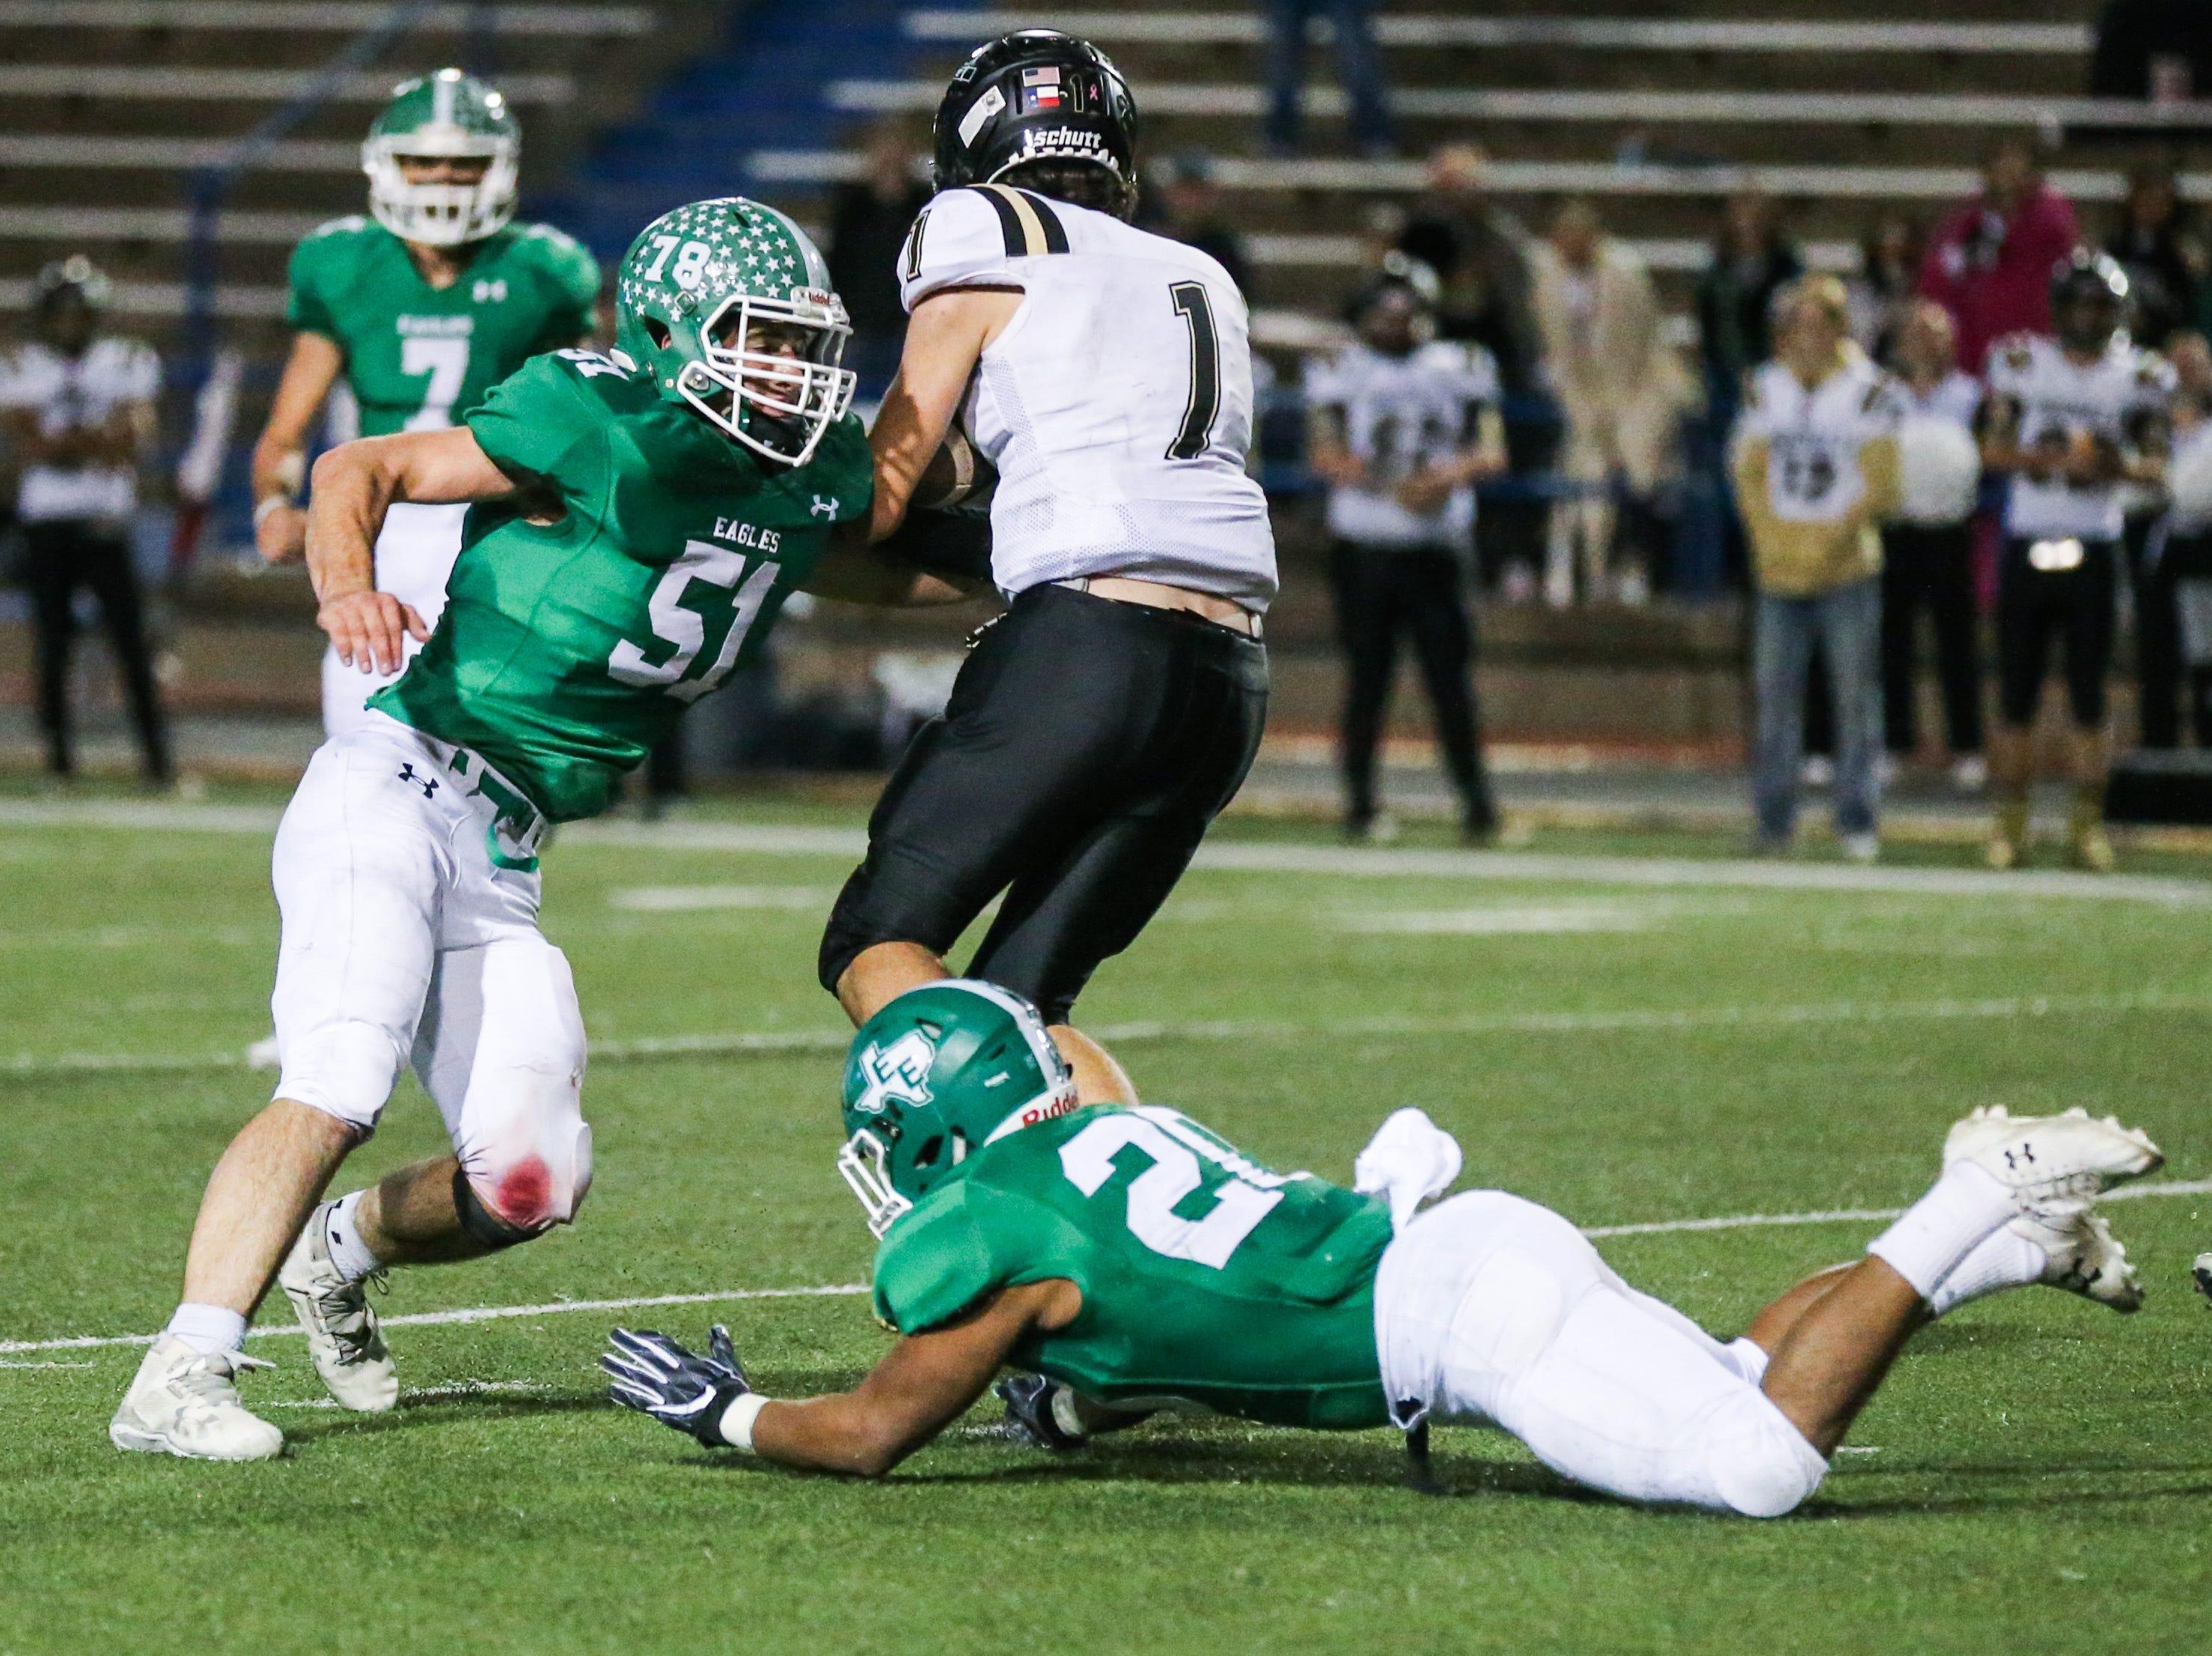 Eldorado defense tackle Haskell ball carrier Friday, Nov. 16, 2018, at San Angelo Stadium.